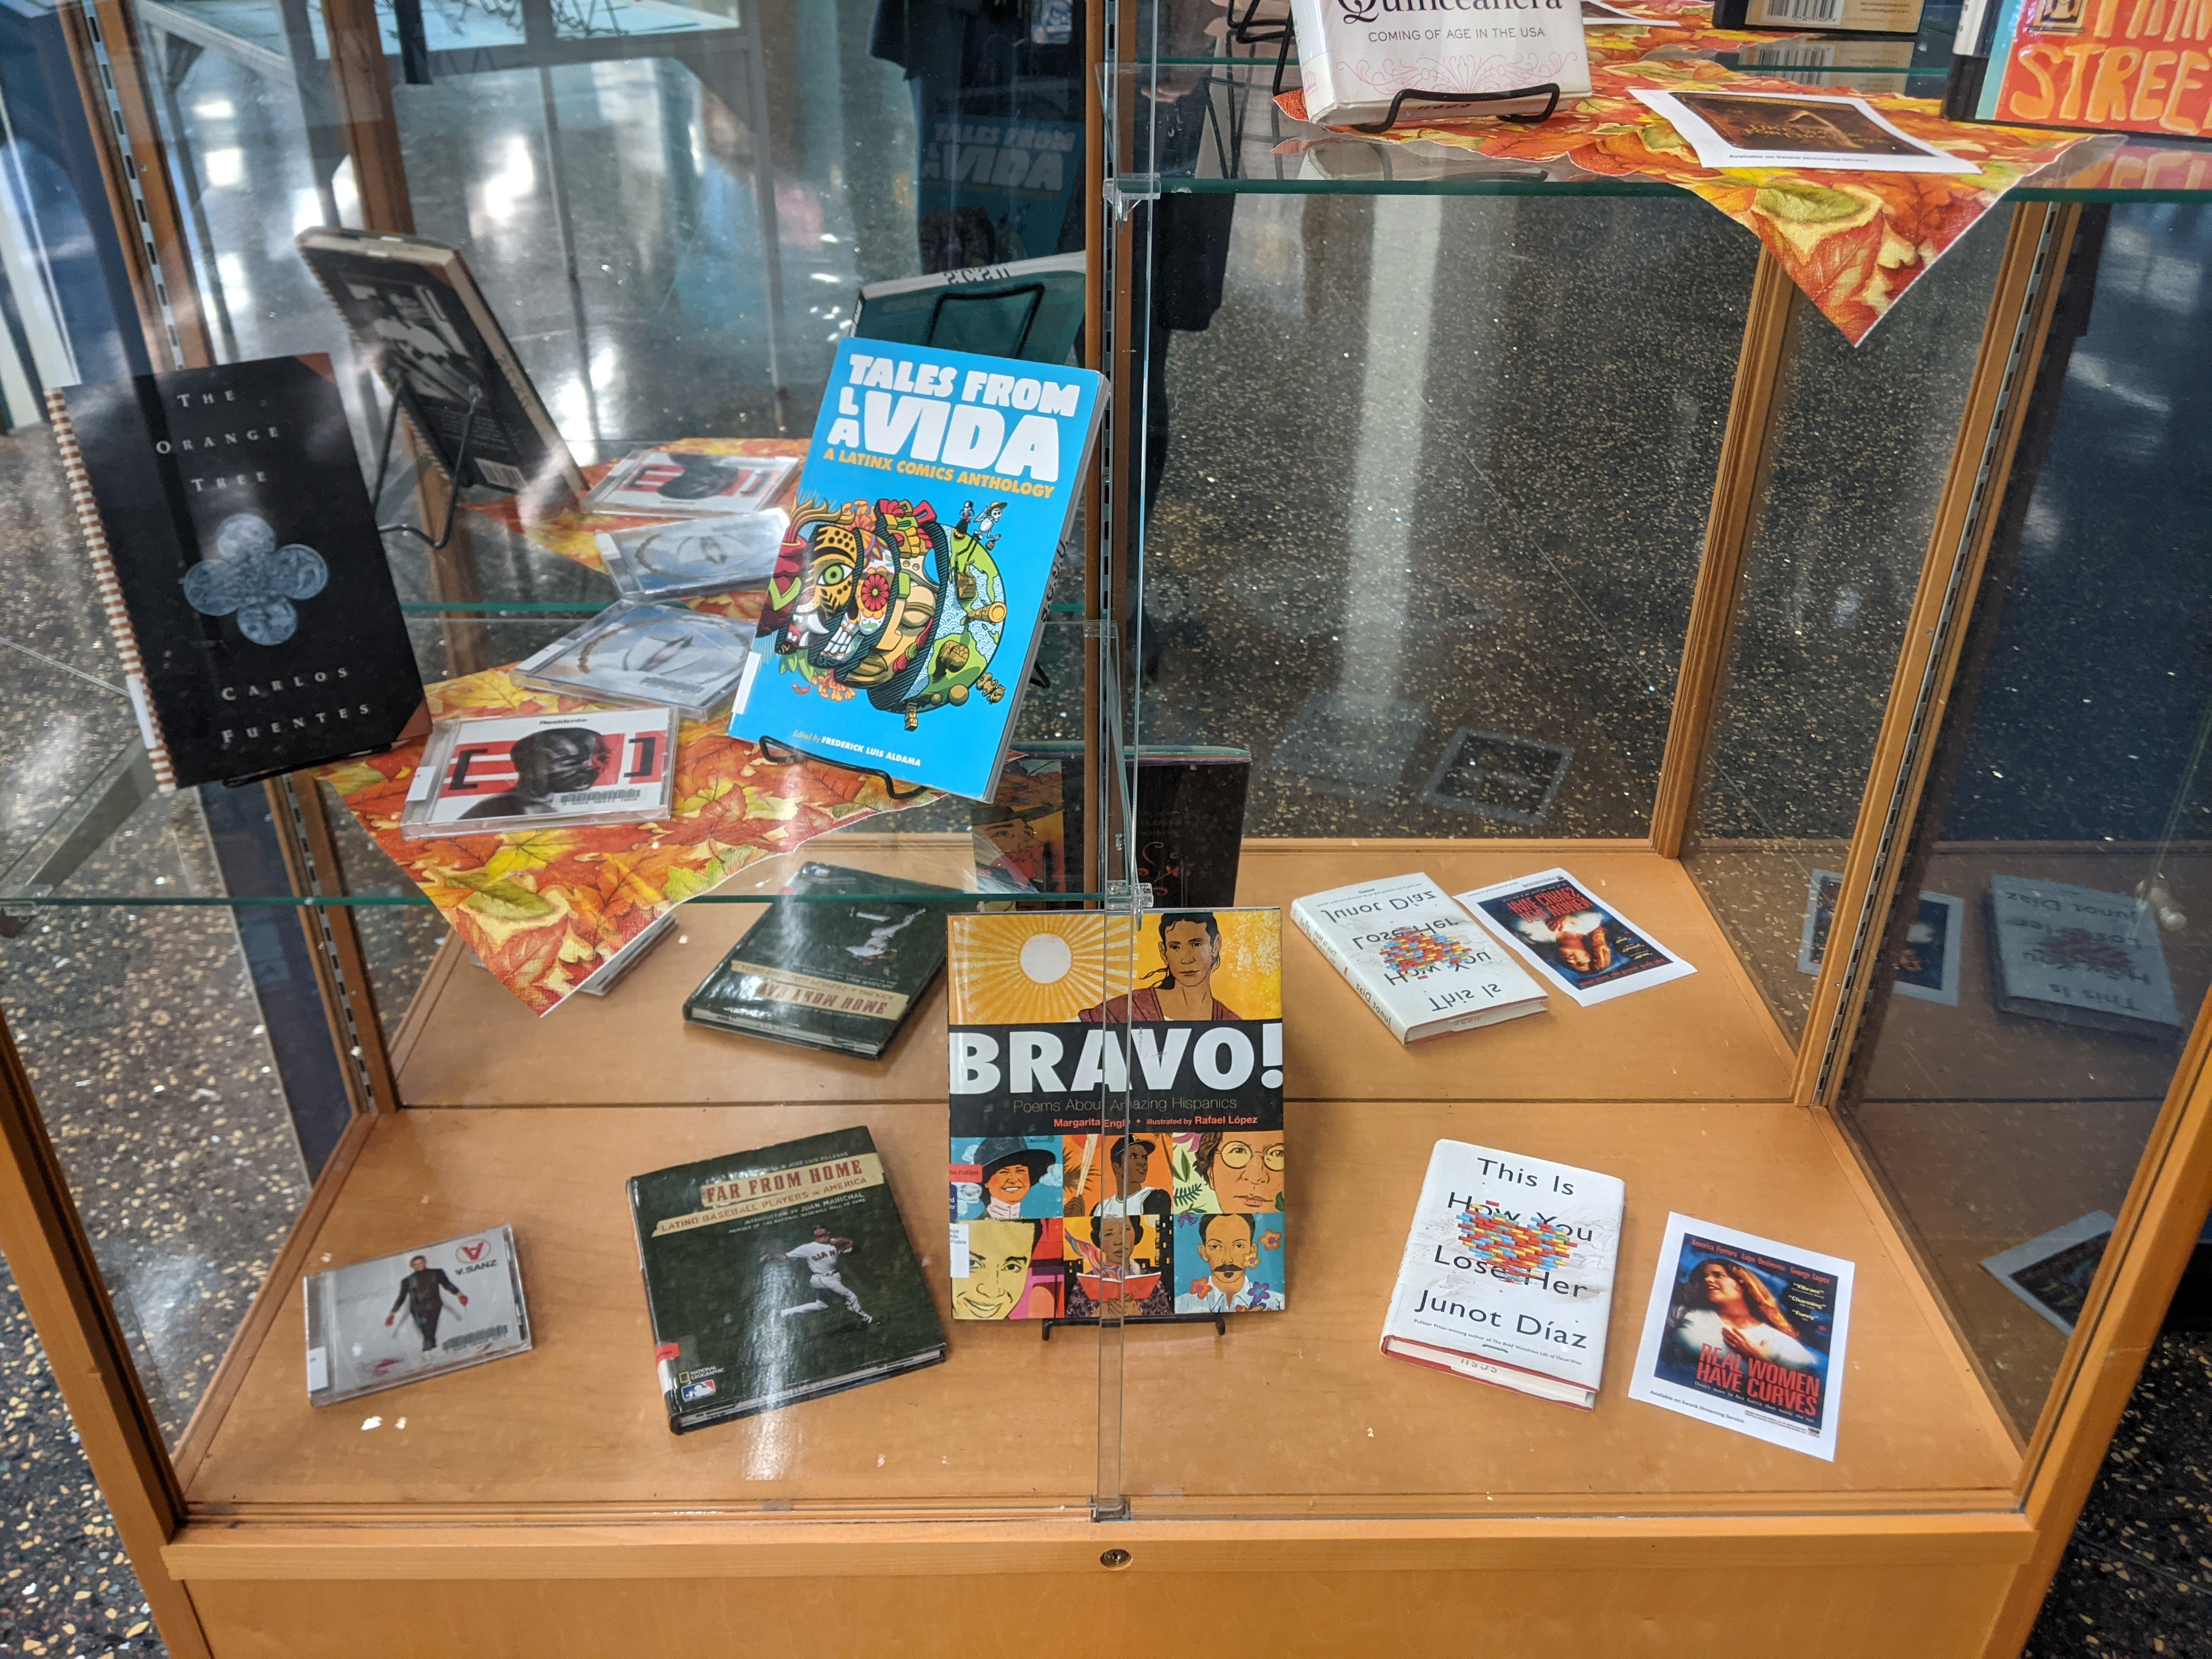 Exhibit case with books